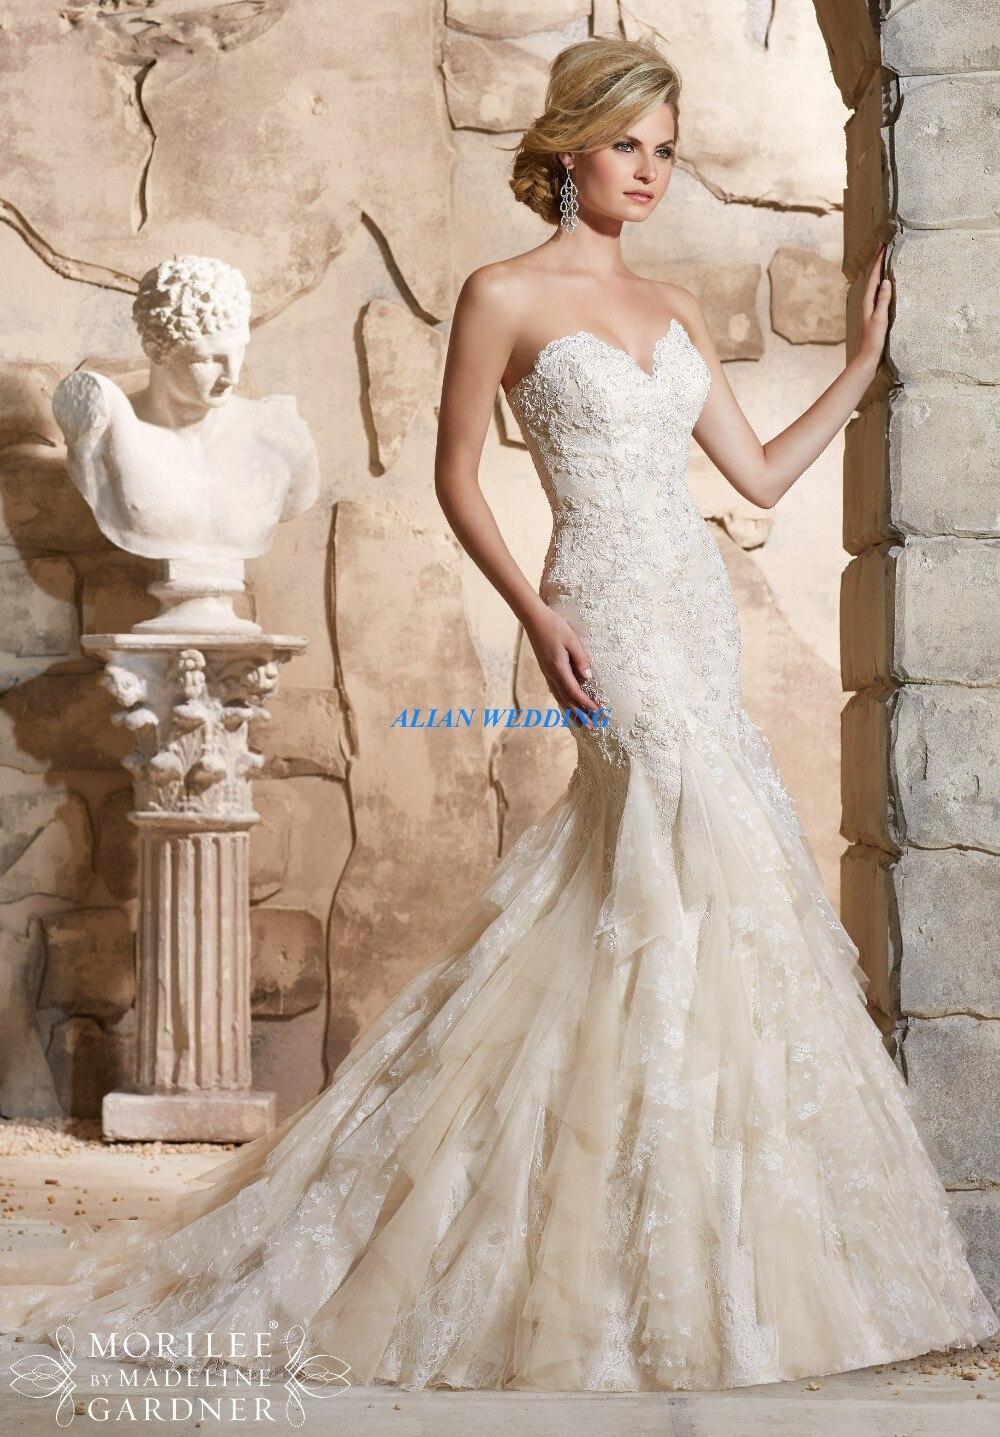 Vogue Hochzeit Kleider Flowy Vintage Vestidos De Novia Appliques ...